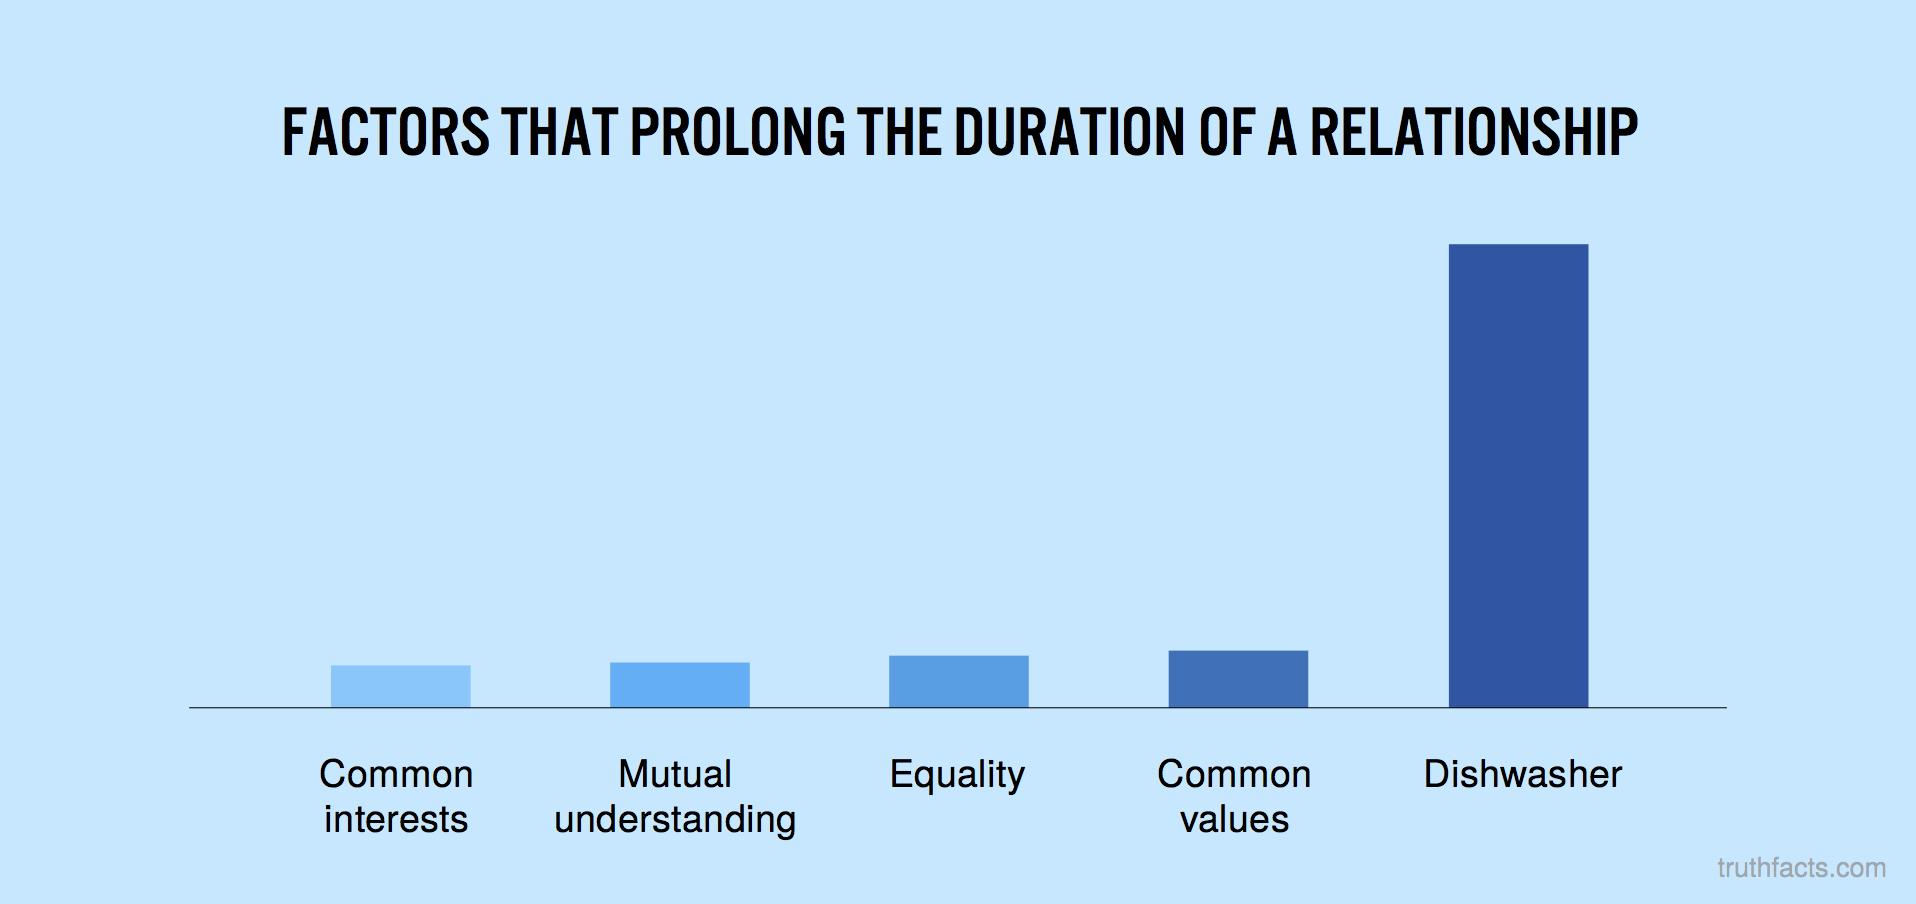 Factors that prolong the duration af a relationship